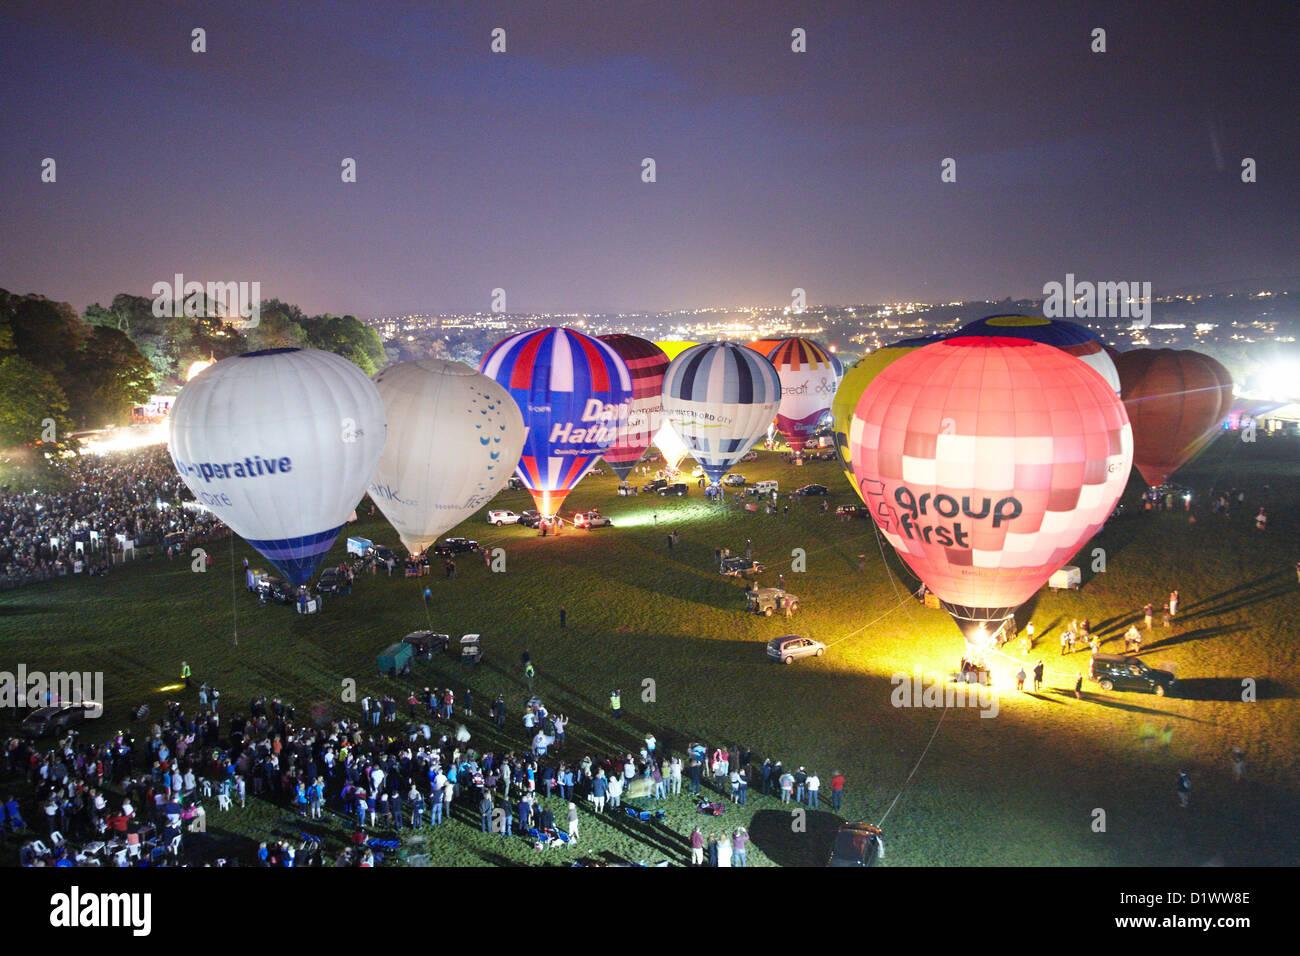 Bristol International Balloon Fiesta Night Glow - Stock Image